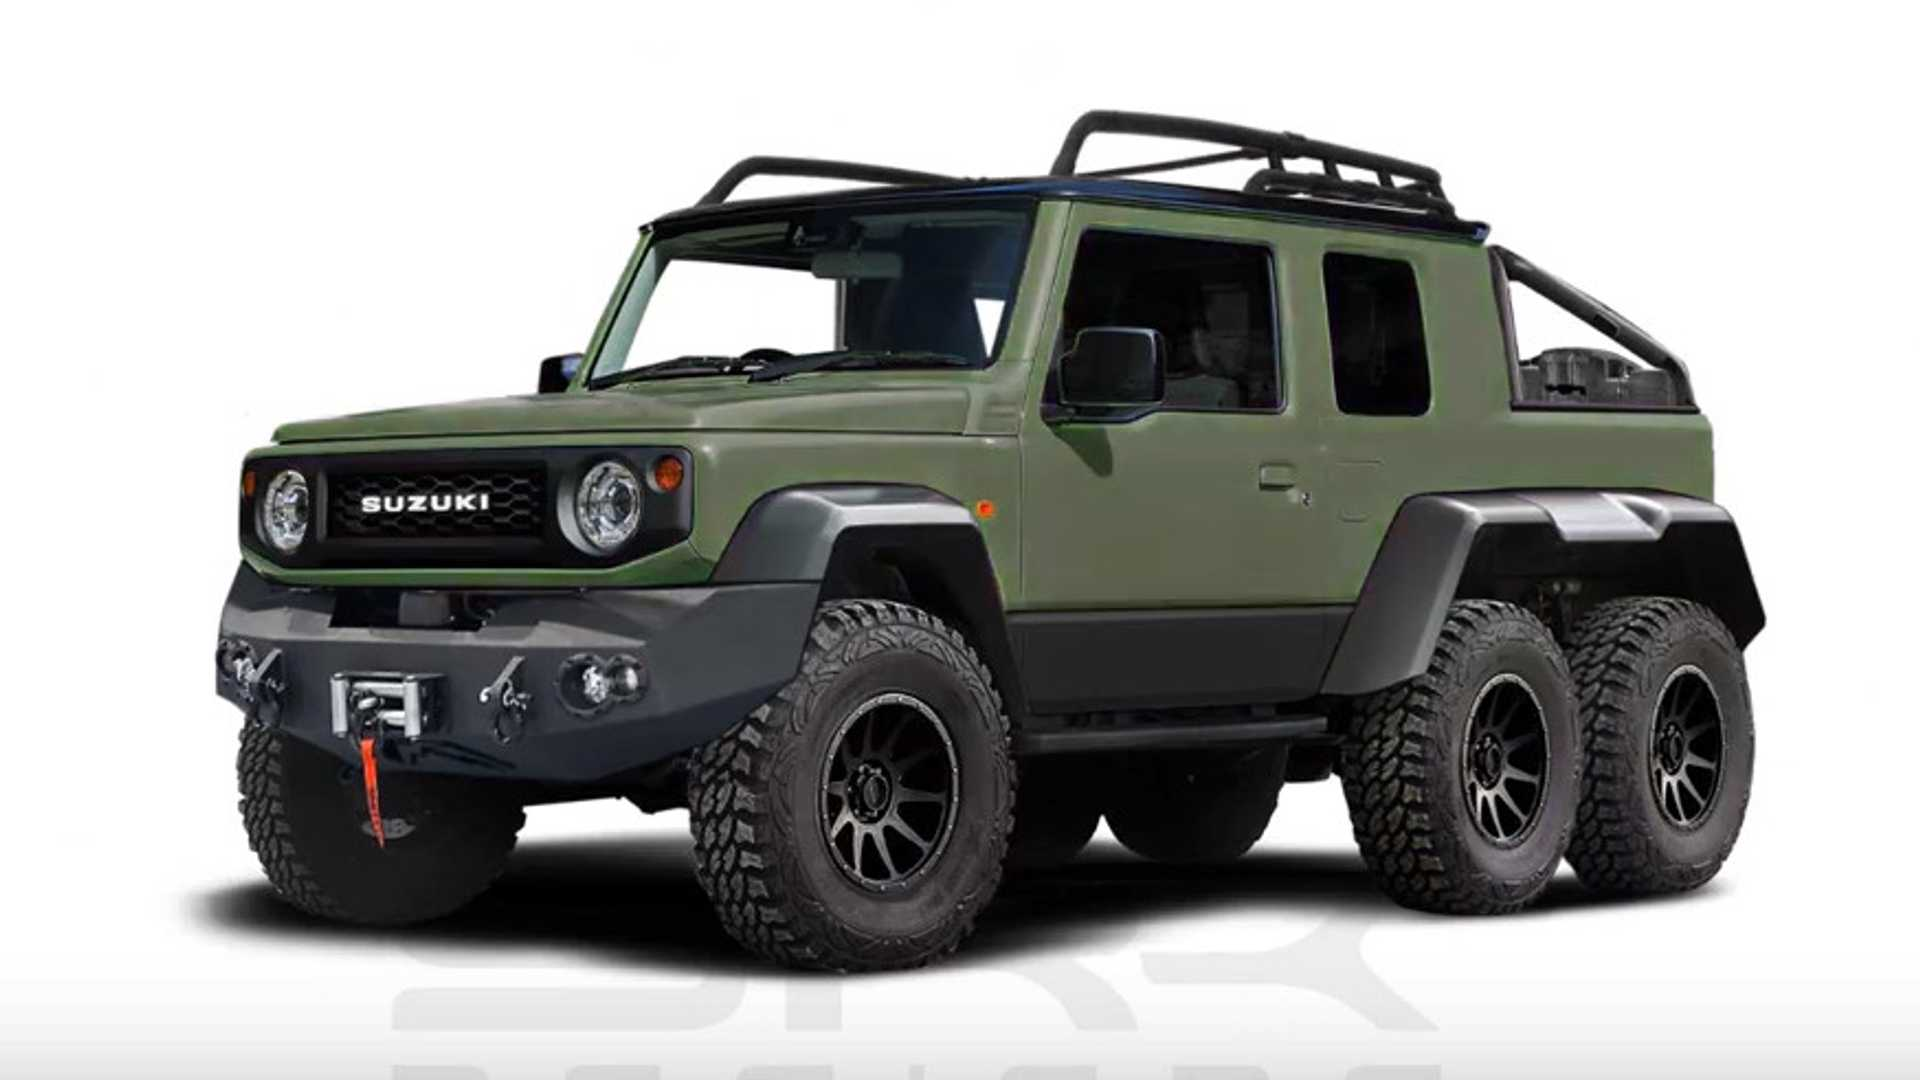 Suzuki Jimny 6x6